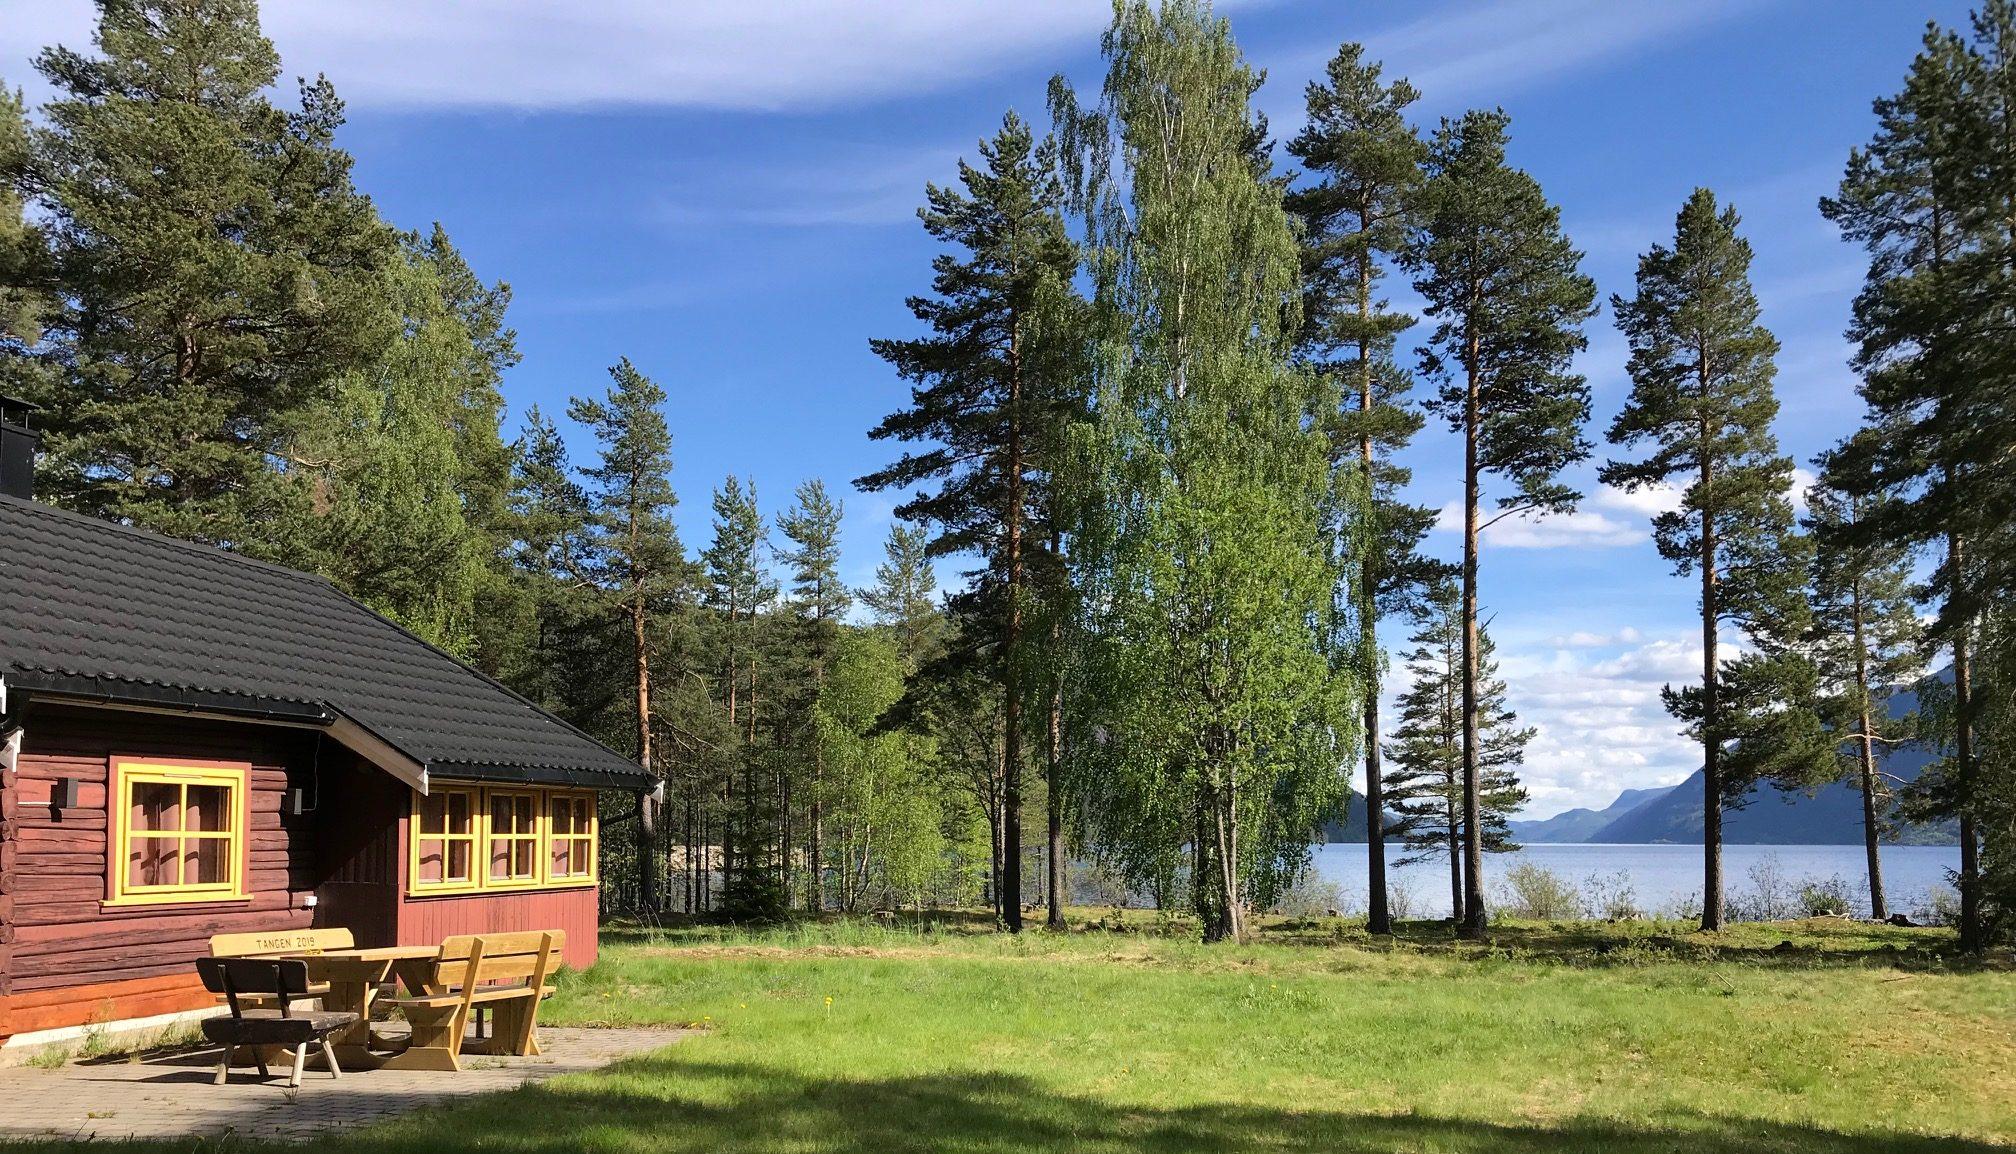 Tangen - idyllisk hytte ved Tinnsjøen